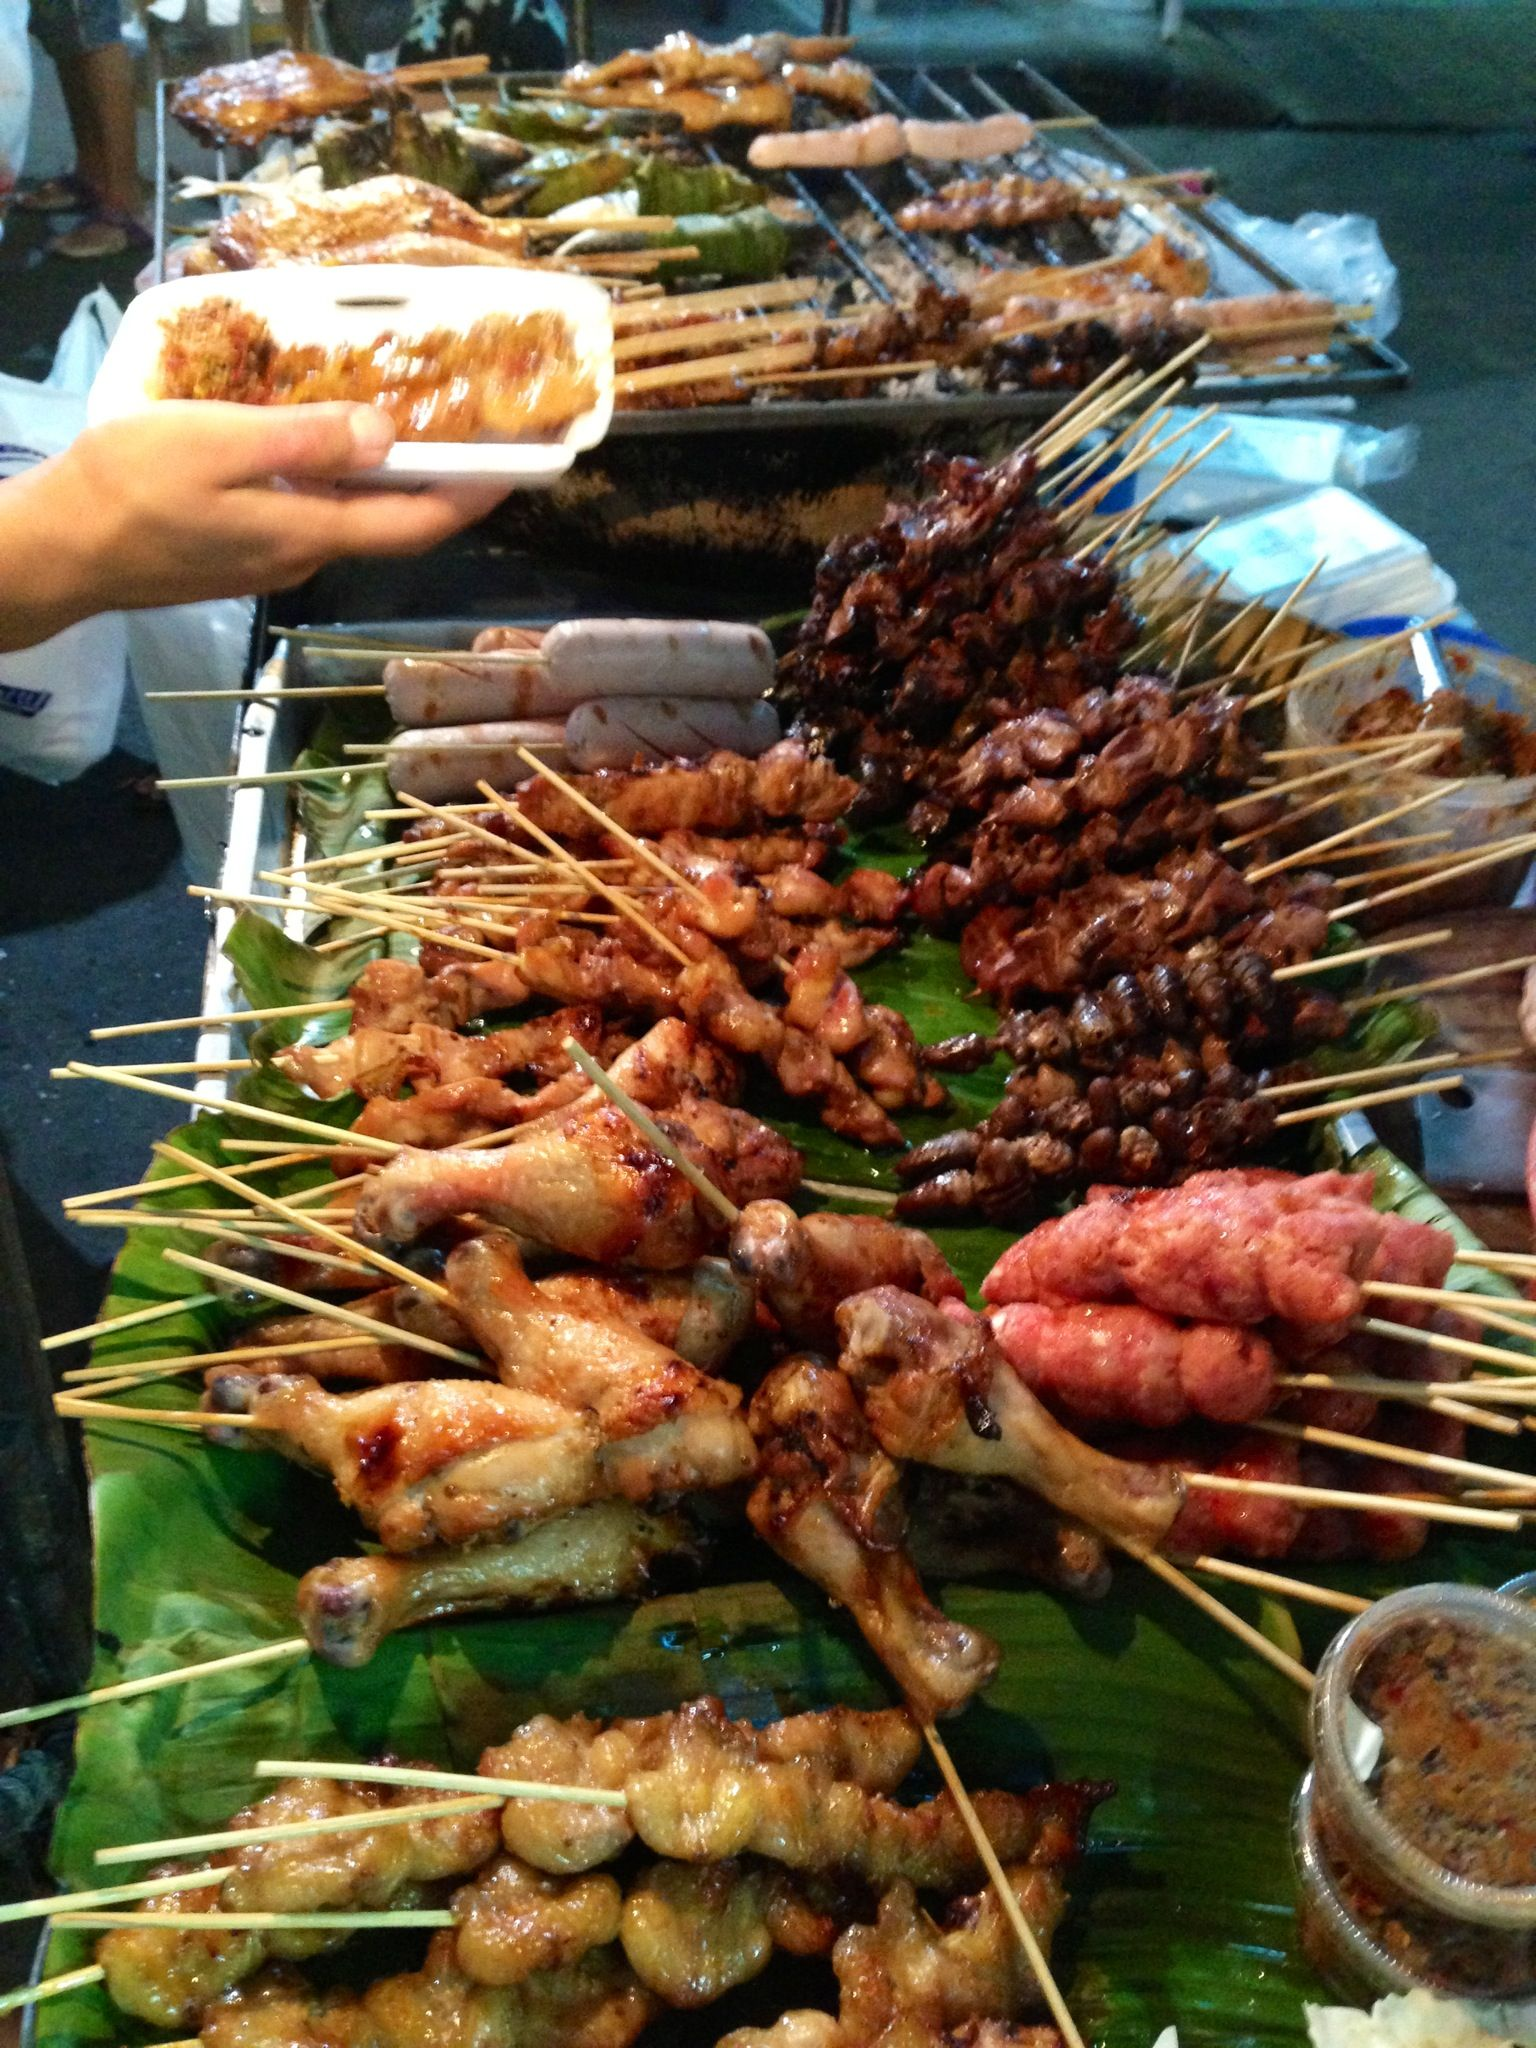 Bangkok Night Market Street Food Explore The World With Travel Nerd Nici One Country At A Time Http Travelnerdn Ide Makanan Makanan Dan Minuman Masakan